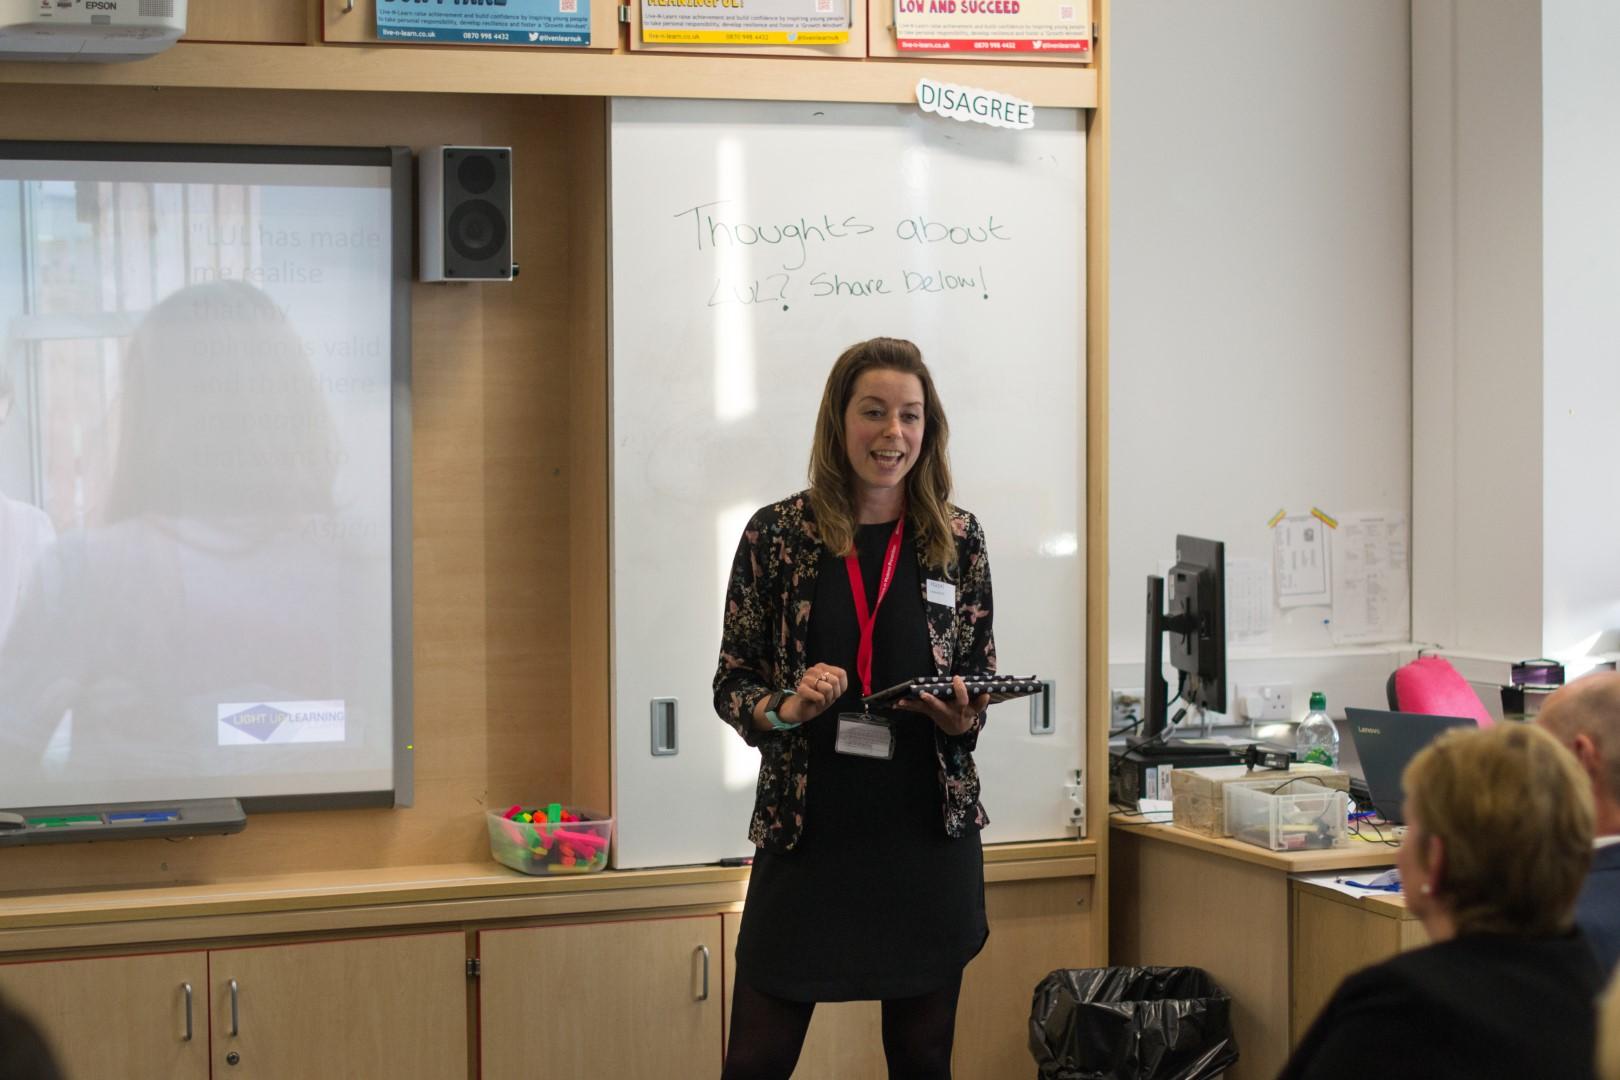 Hazel Moar, our incredible Lasswade liaison, speaks to the school's experience of the LUL programme